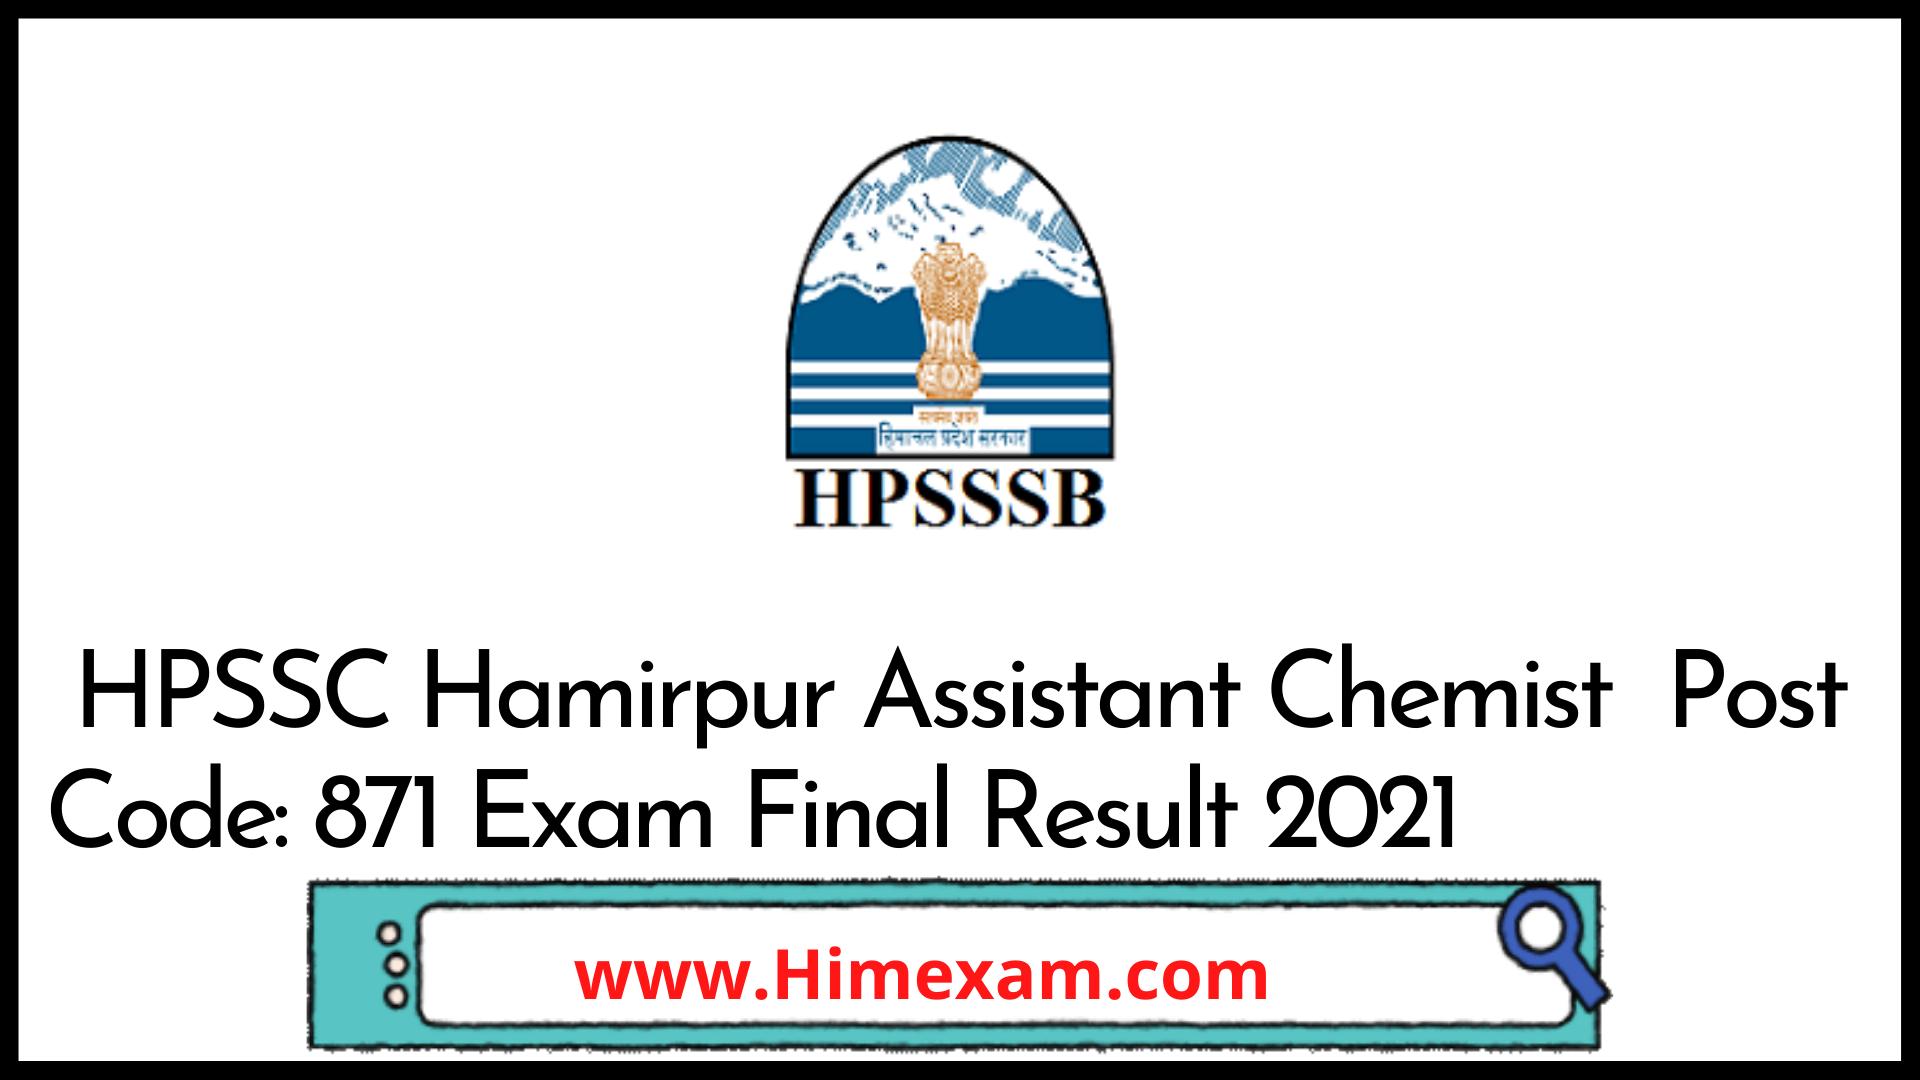 HPSSC Hamirpur Assistant Chemist  Post Code: 871 Exam Final Result 2021